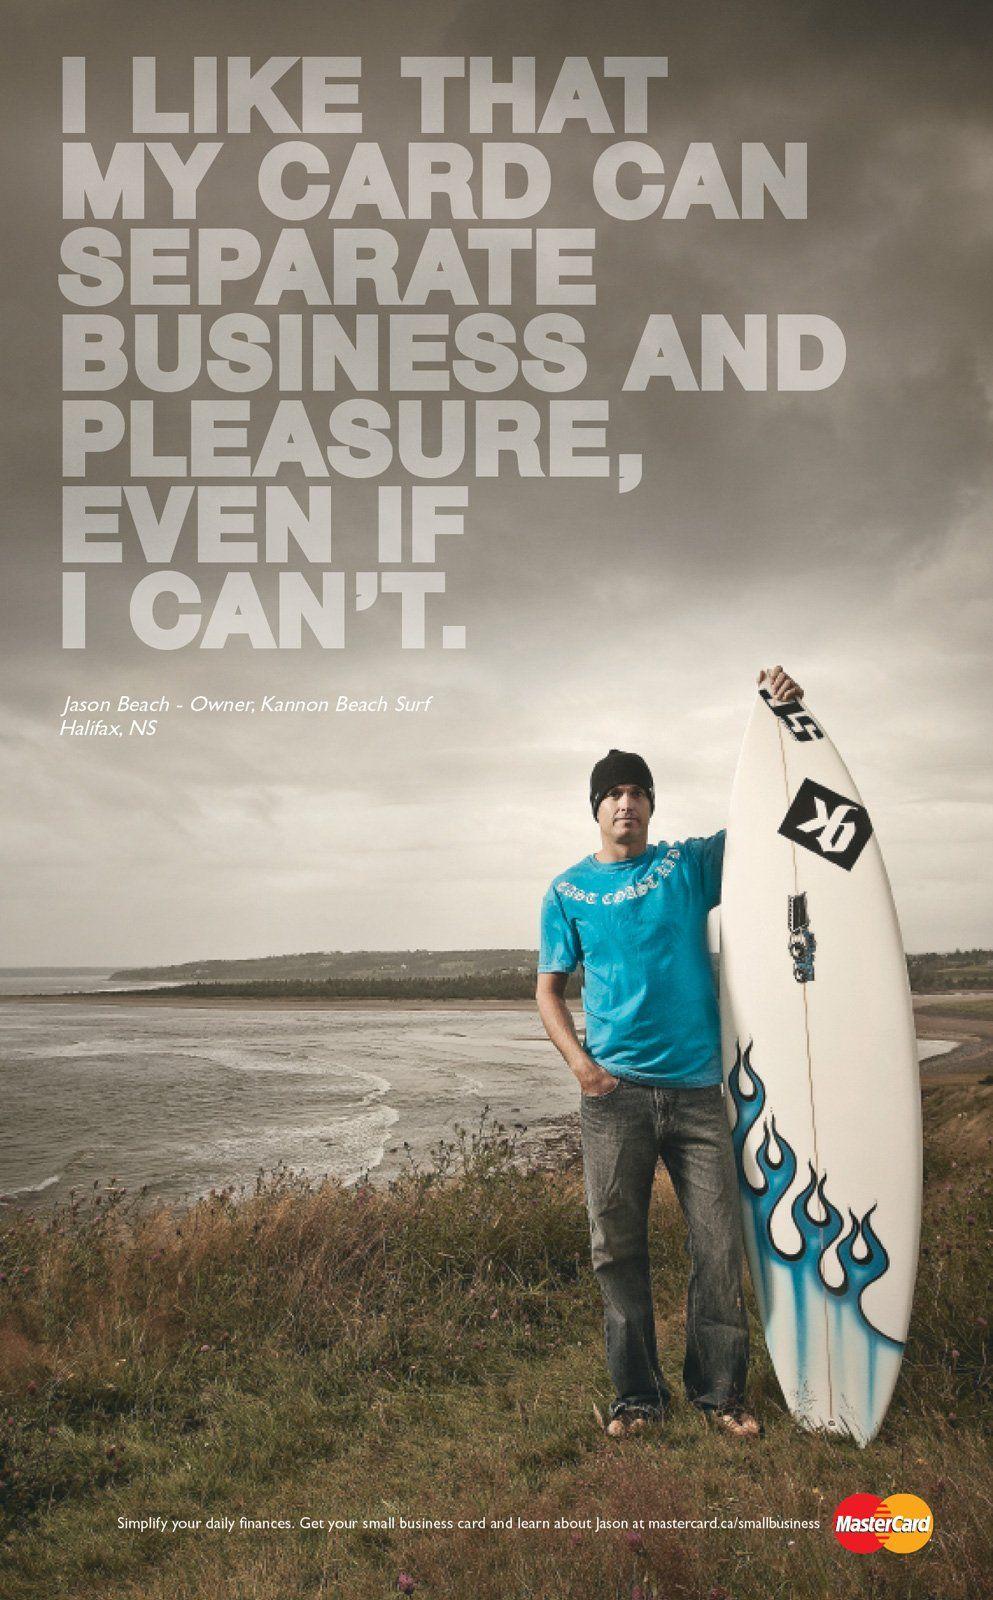 mastercard business ad campaign | Mastercard: